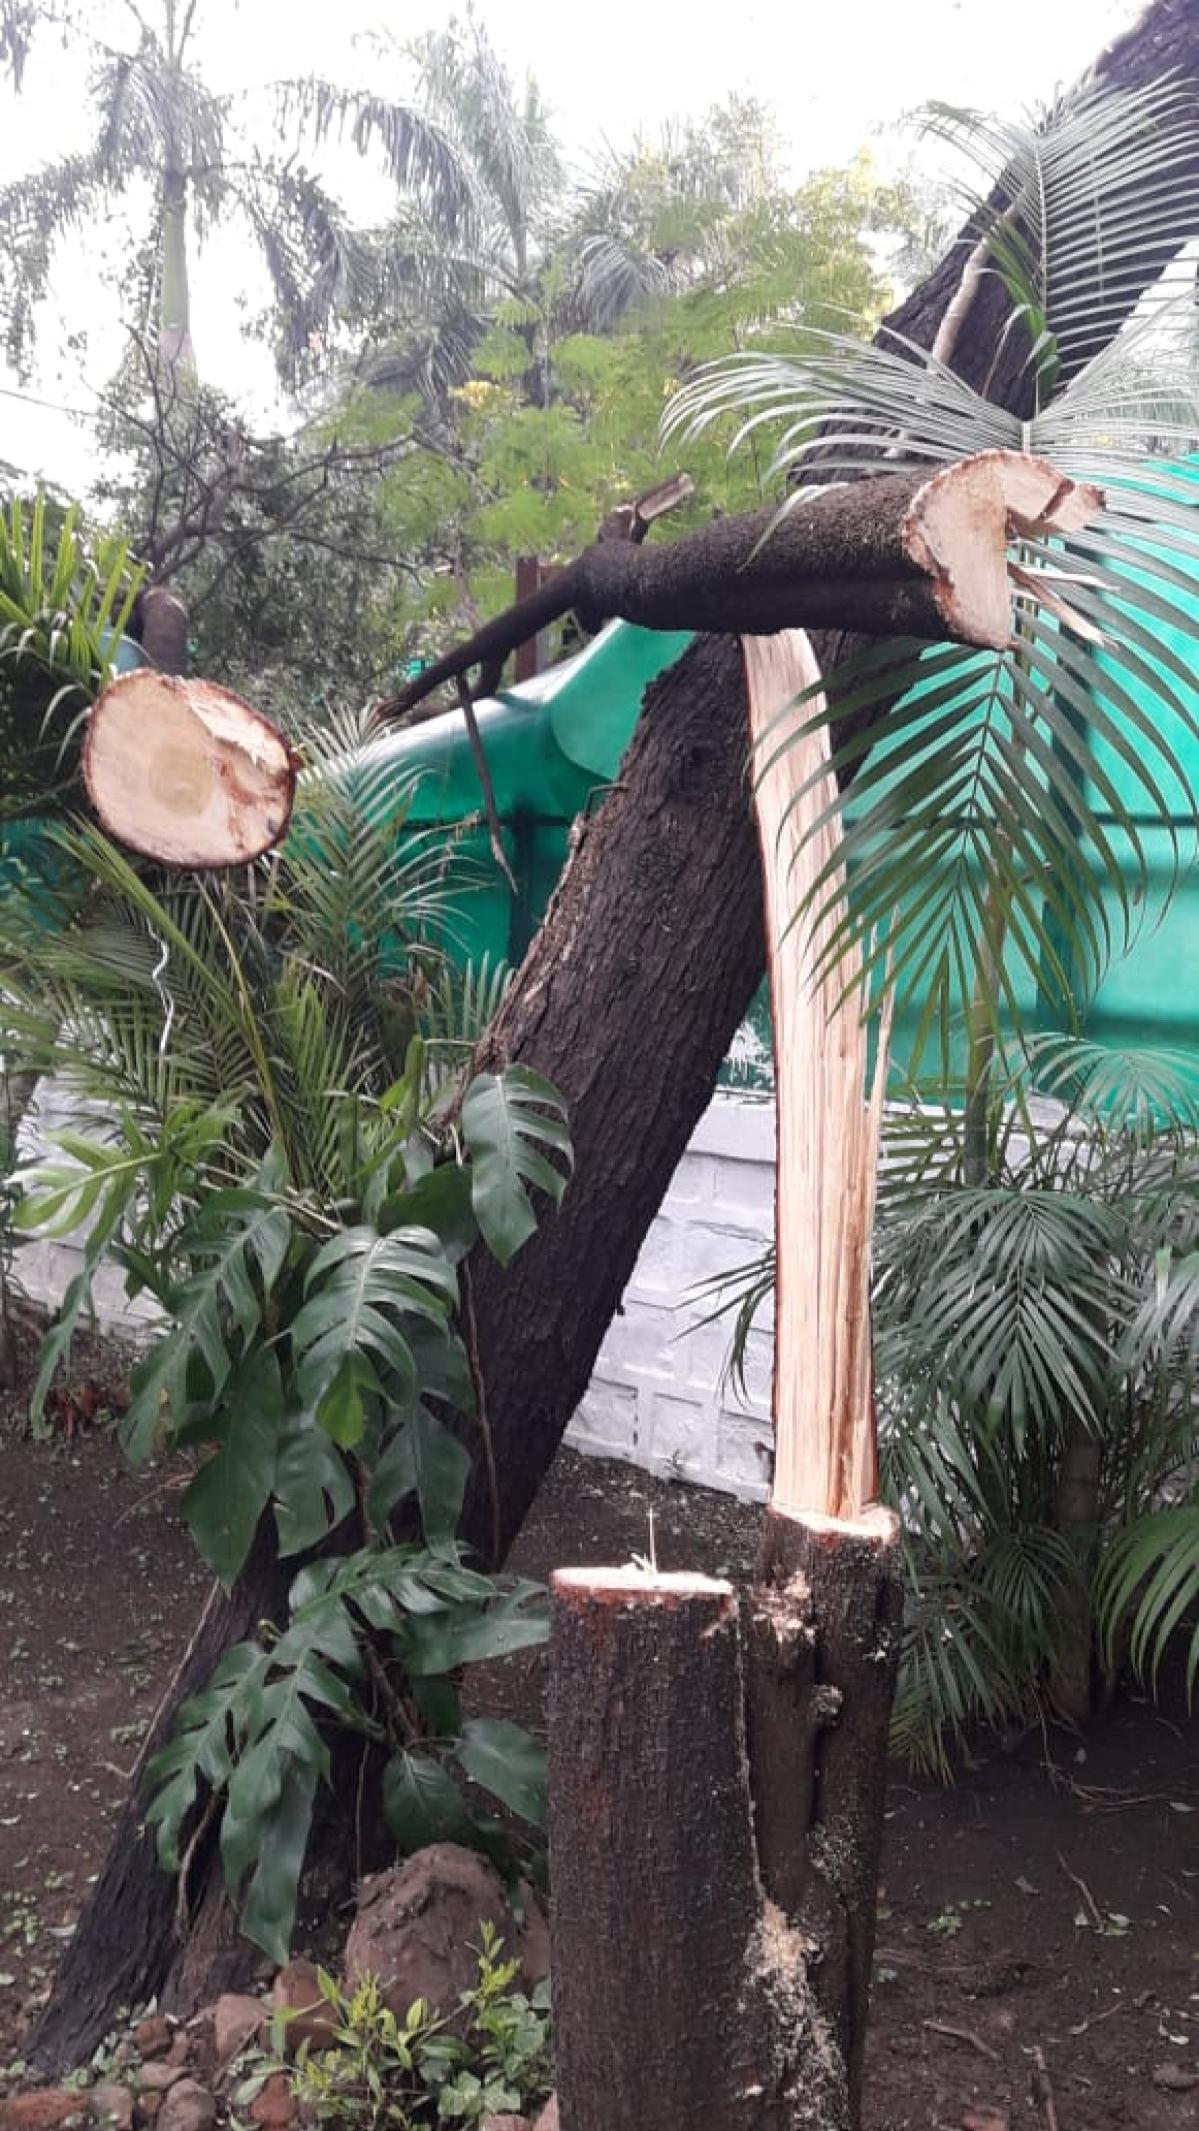 Miscreants fell sandalwood tree in minister's bungalow in Bhopal